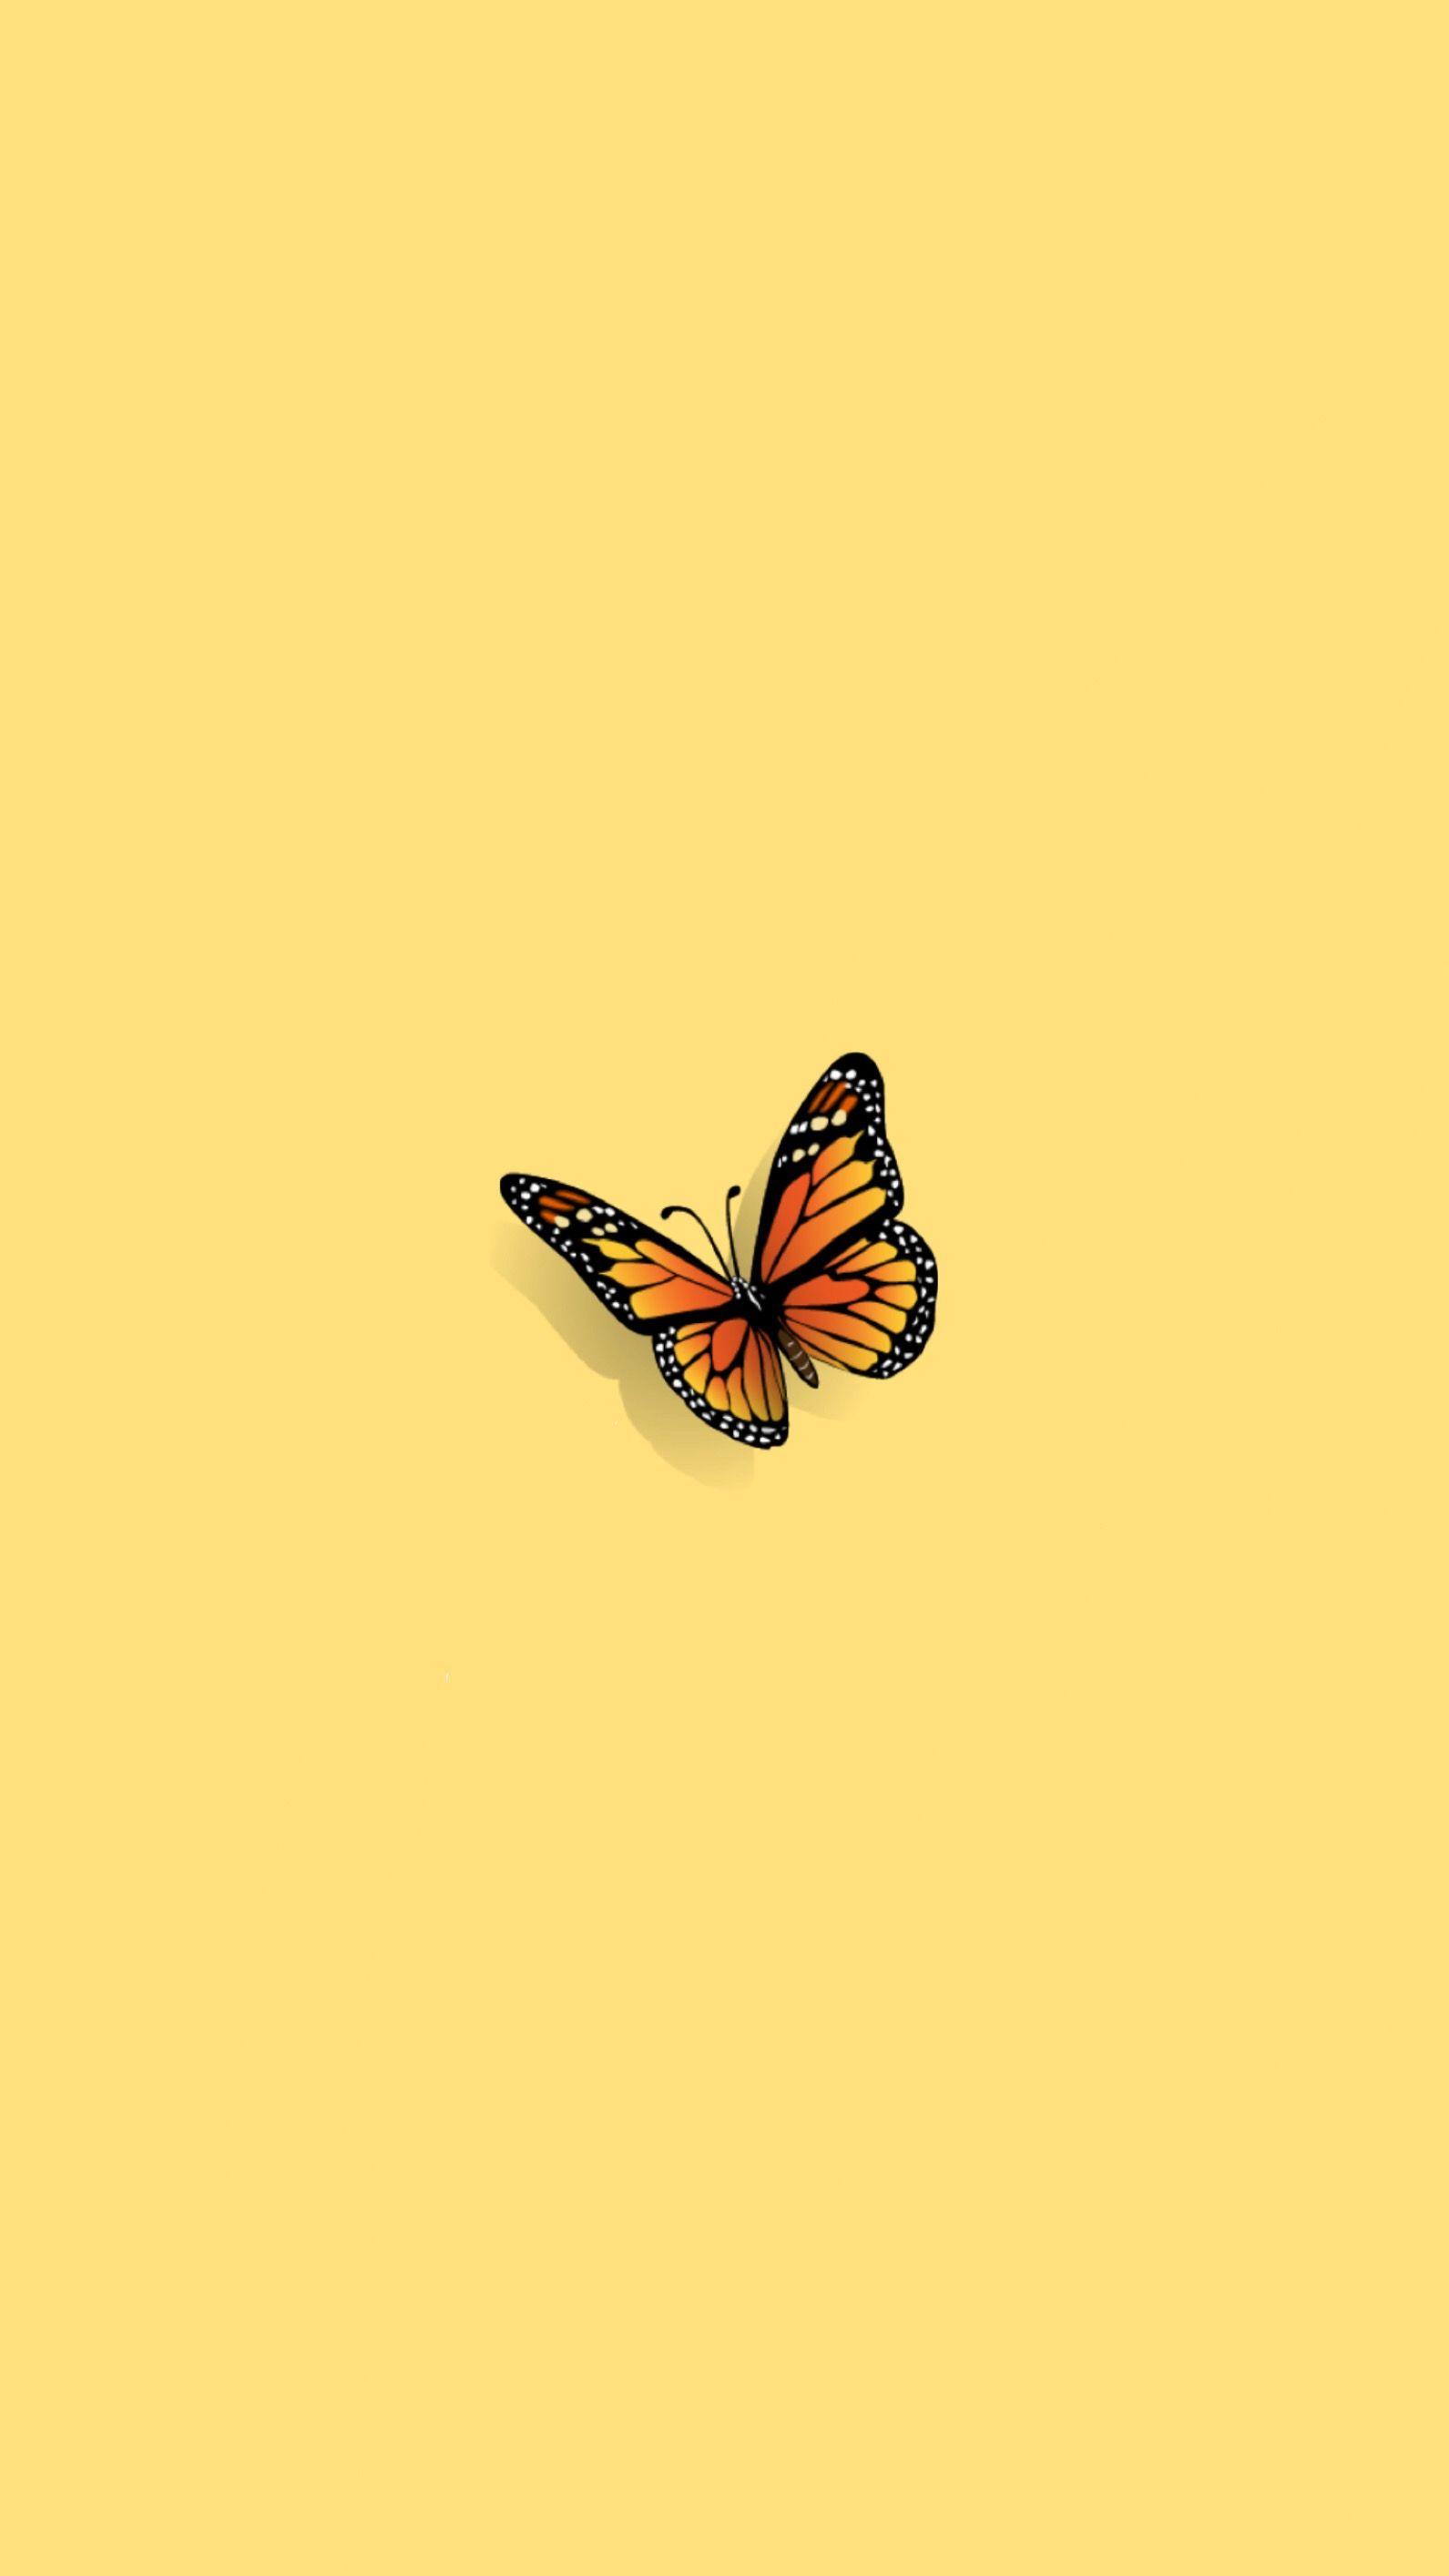 Cute Yellow Butterfly Wallpaper